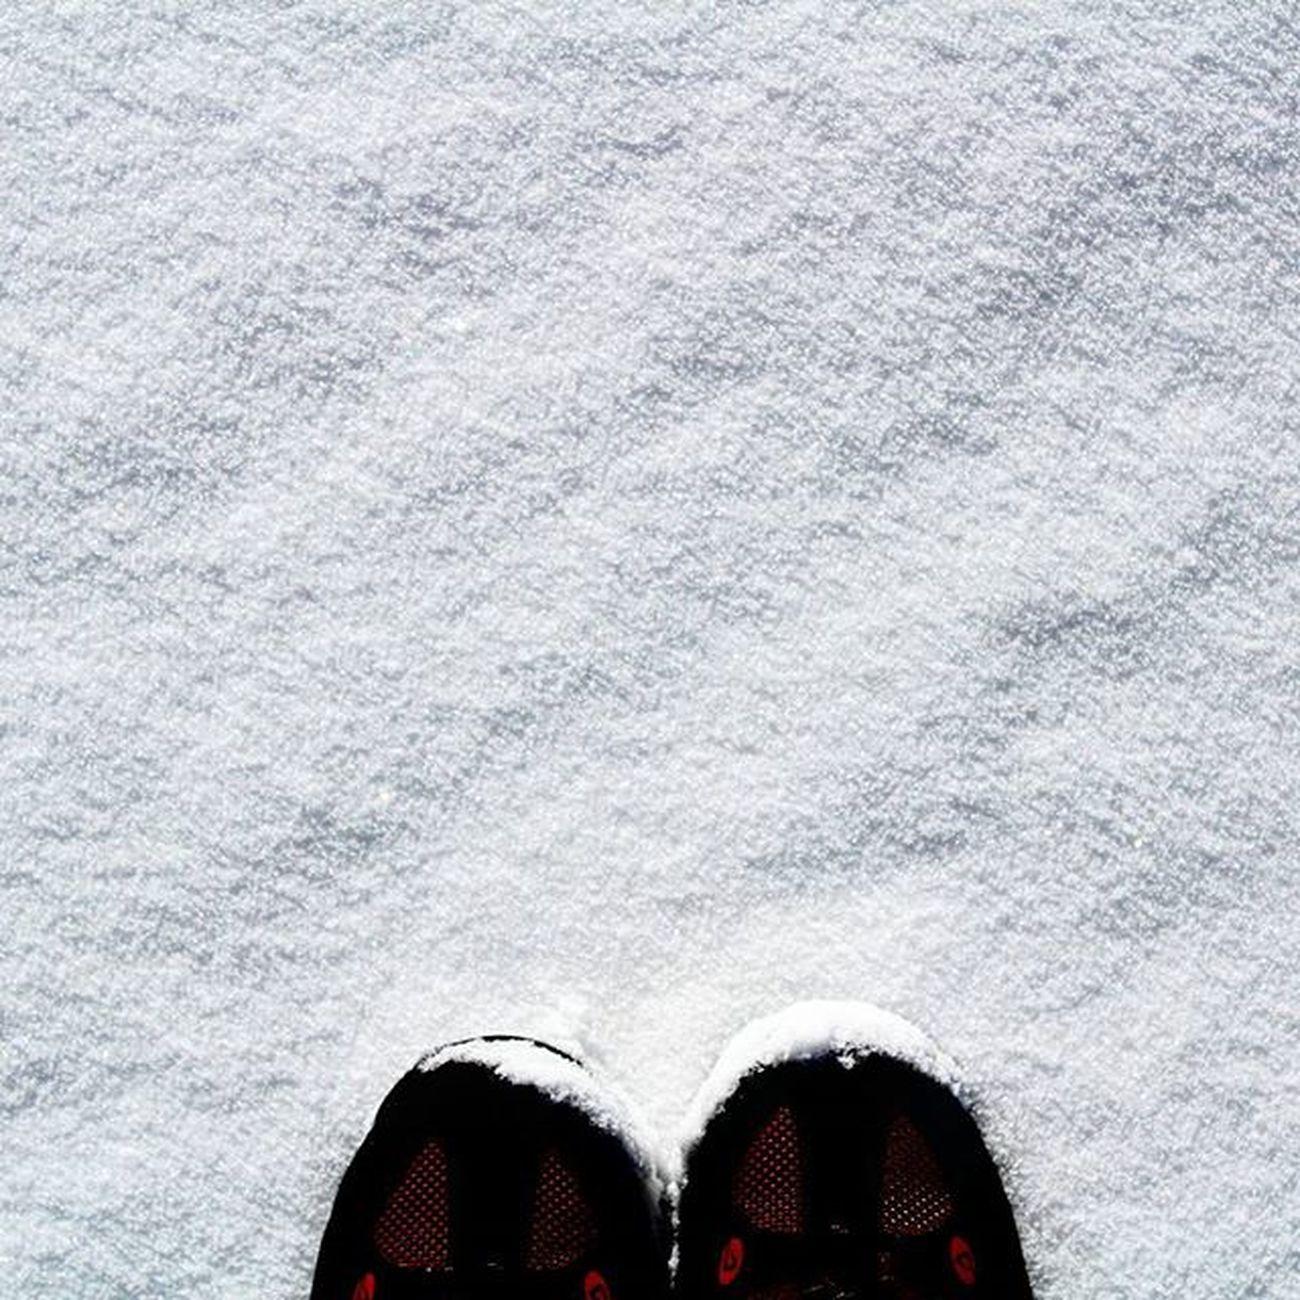 Feet & Trekking Myvallo Igers_salerno Igerscampania Igeritalia Dafareasassano Dafareasalerno Dafareincampania Insolitaitalia Campaniafelix Dolomite White Snowday Wintertime Instanature Instaday Fromwhereistand Ihavethisthingwithfloors Feet